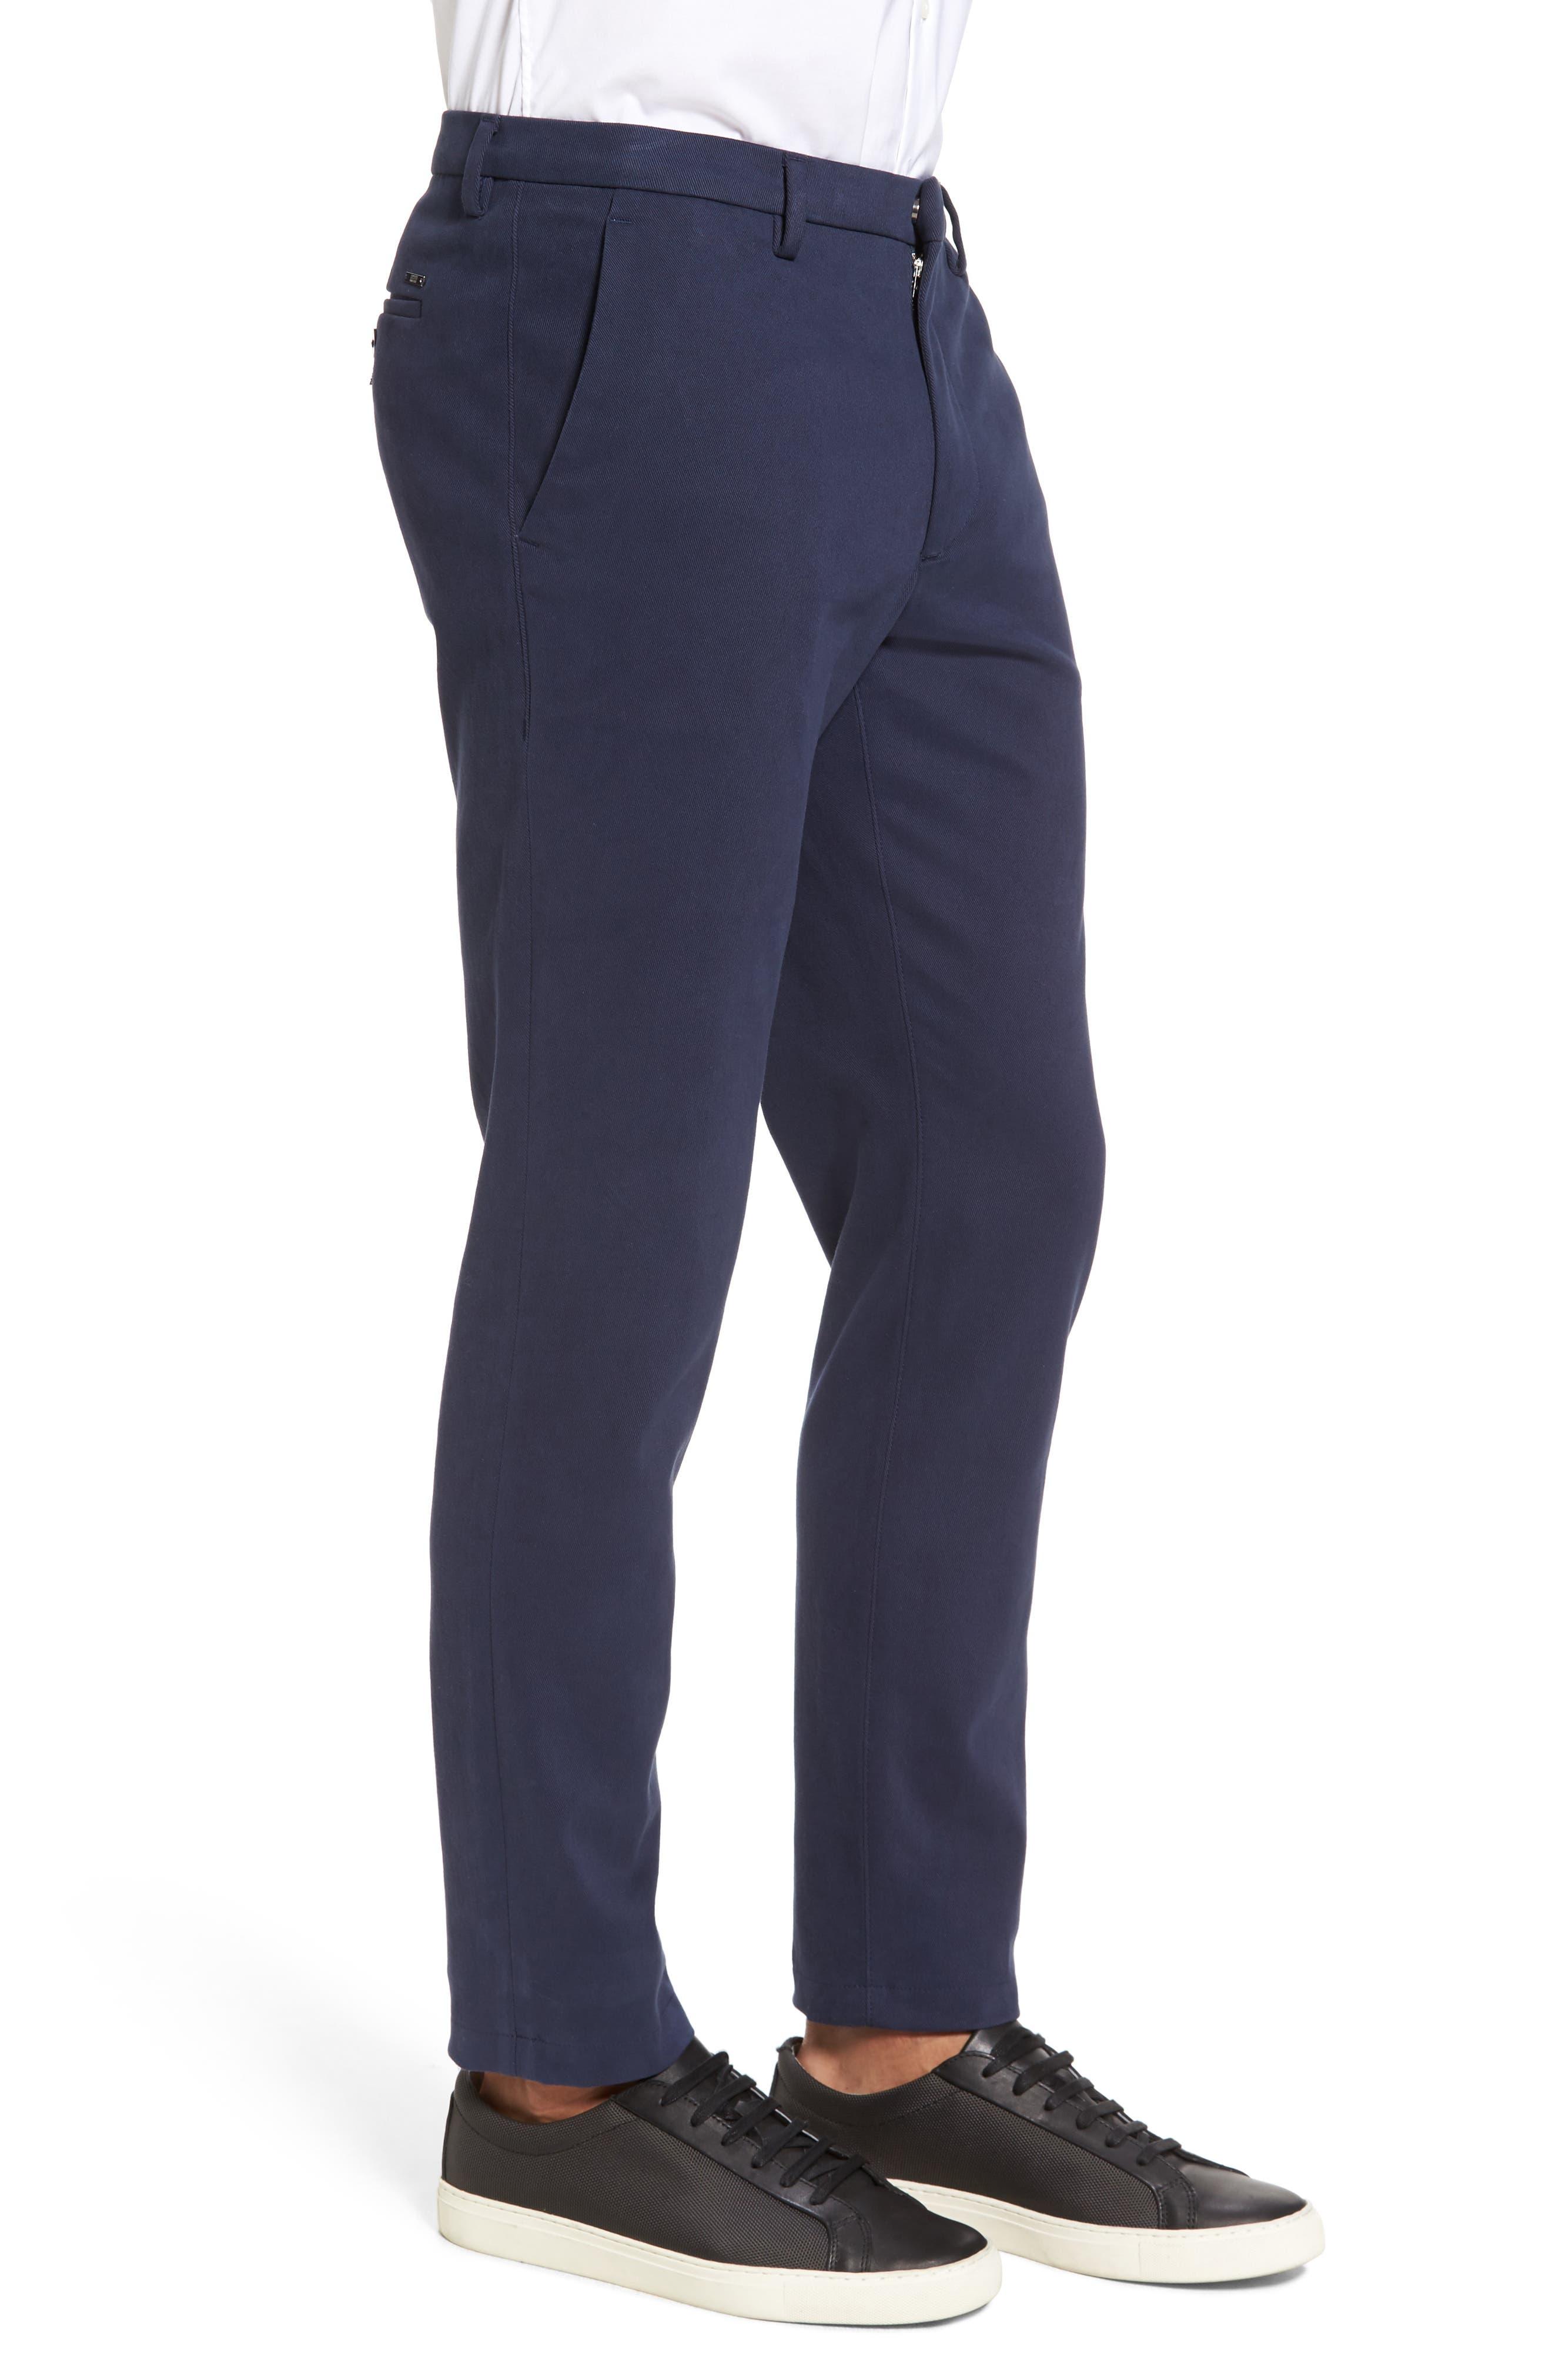 Kaito Stretch Chino Pants,                             Alternate thumbnail 4, color,                             Blue